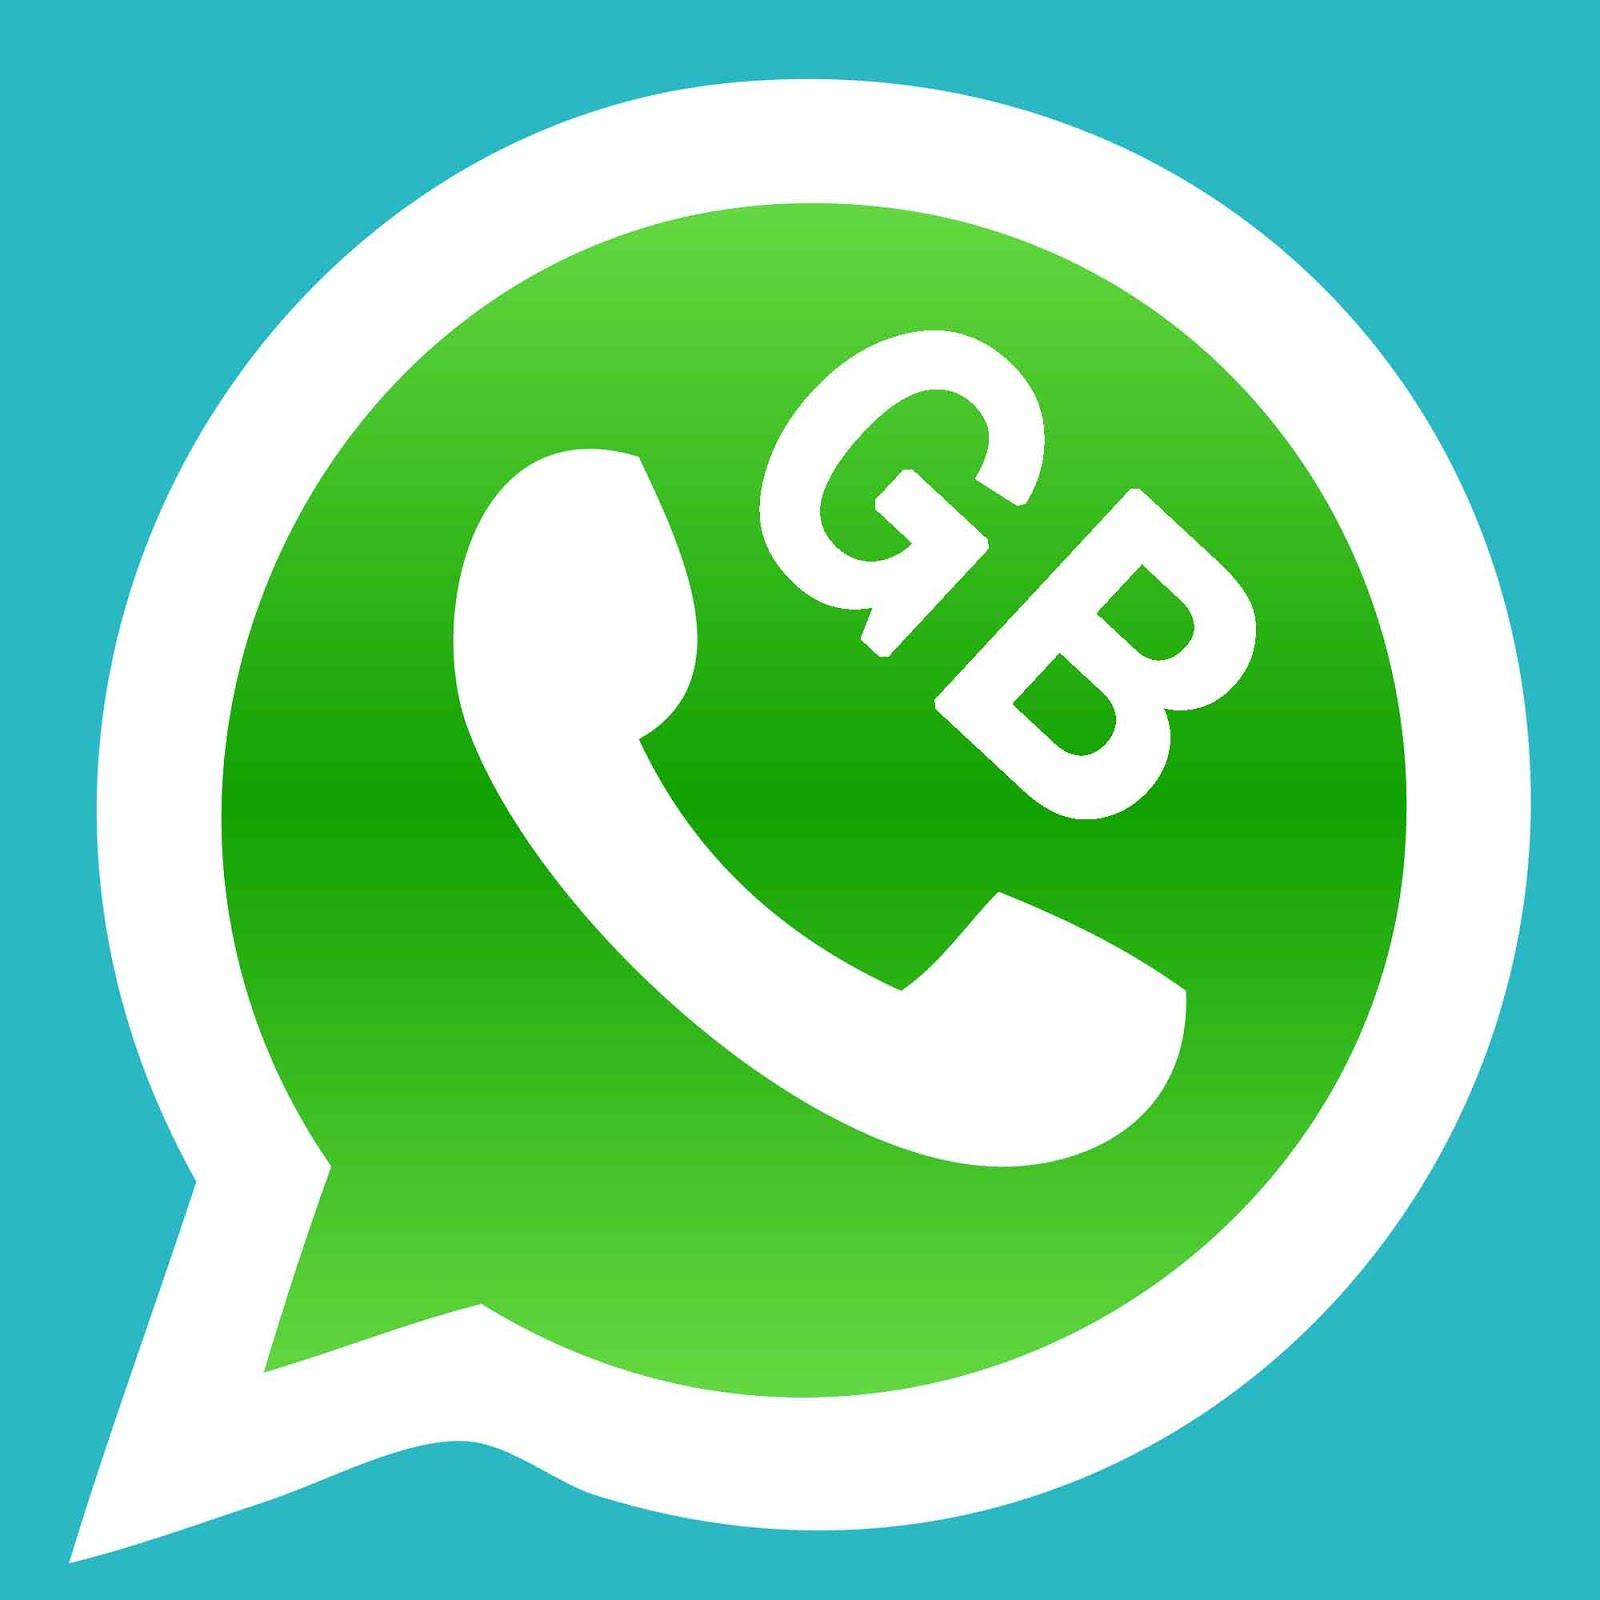 gb whatsapp new version apk